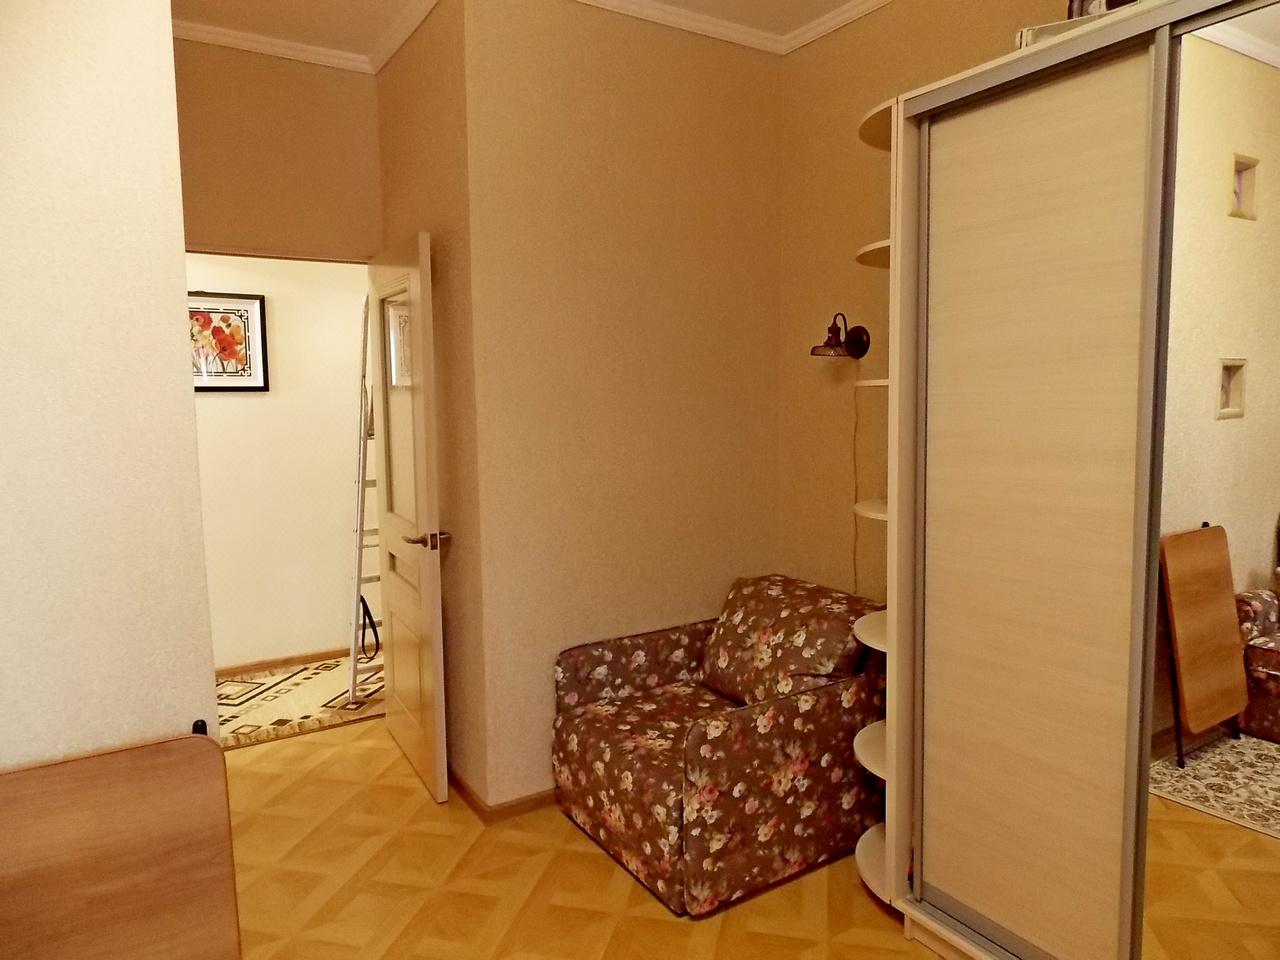 Квартира с ремонтов в ЖК Шале Ла Рош 11